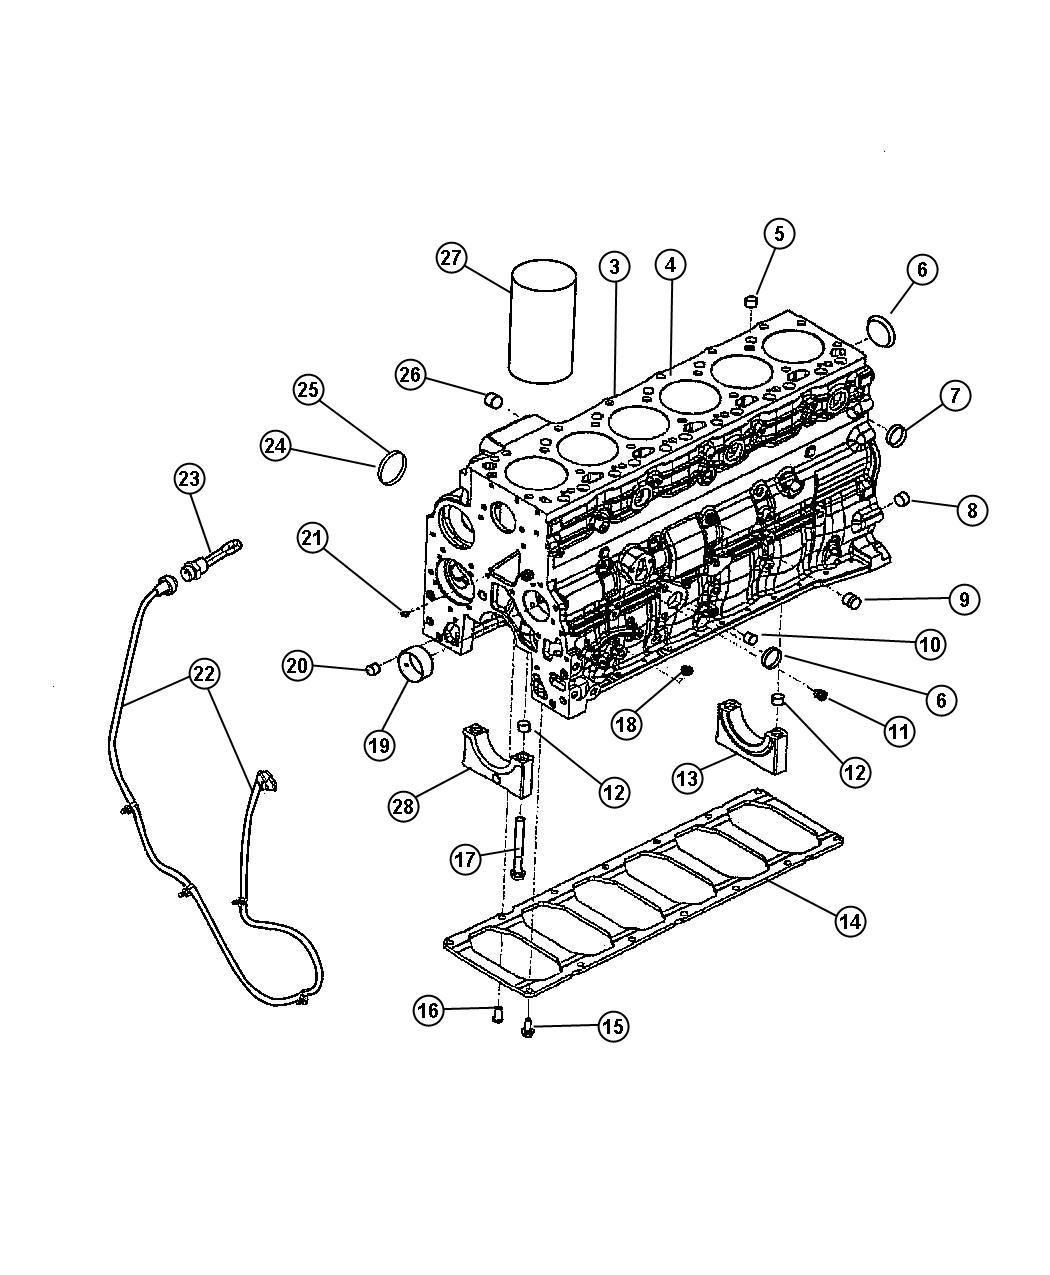 Dodge Ram 2500 Engine  Complete  Remanufactured